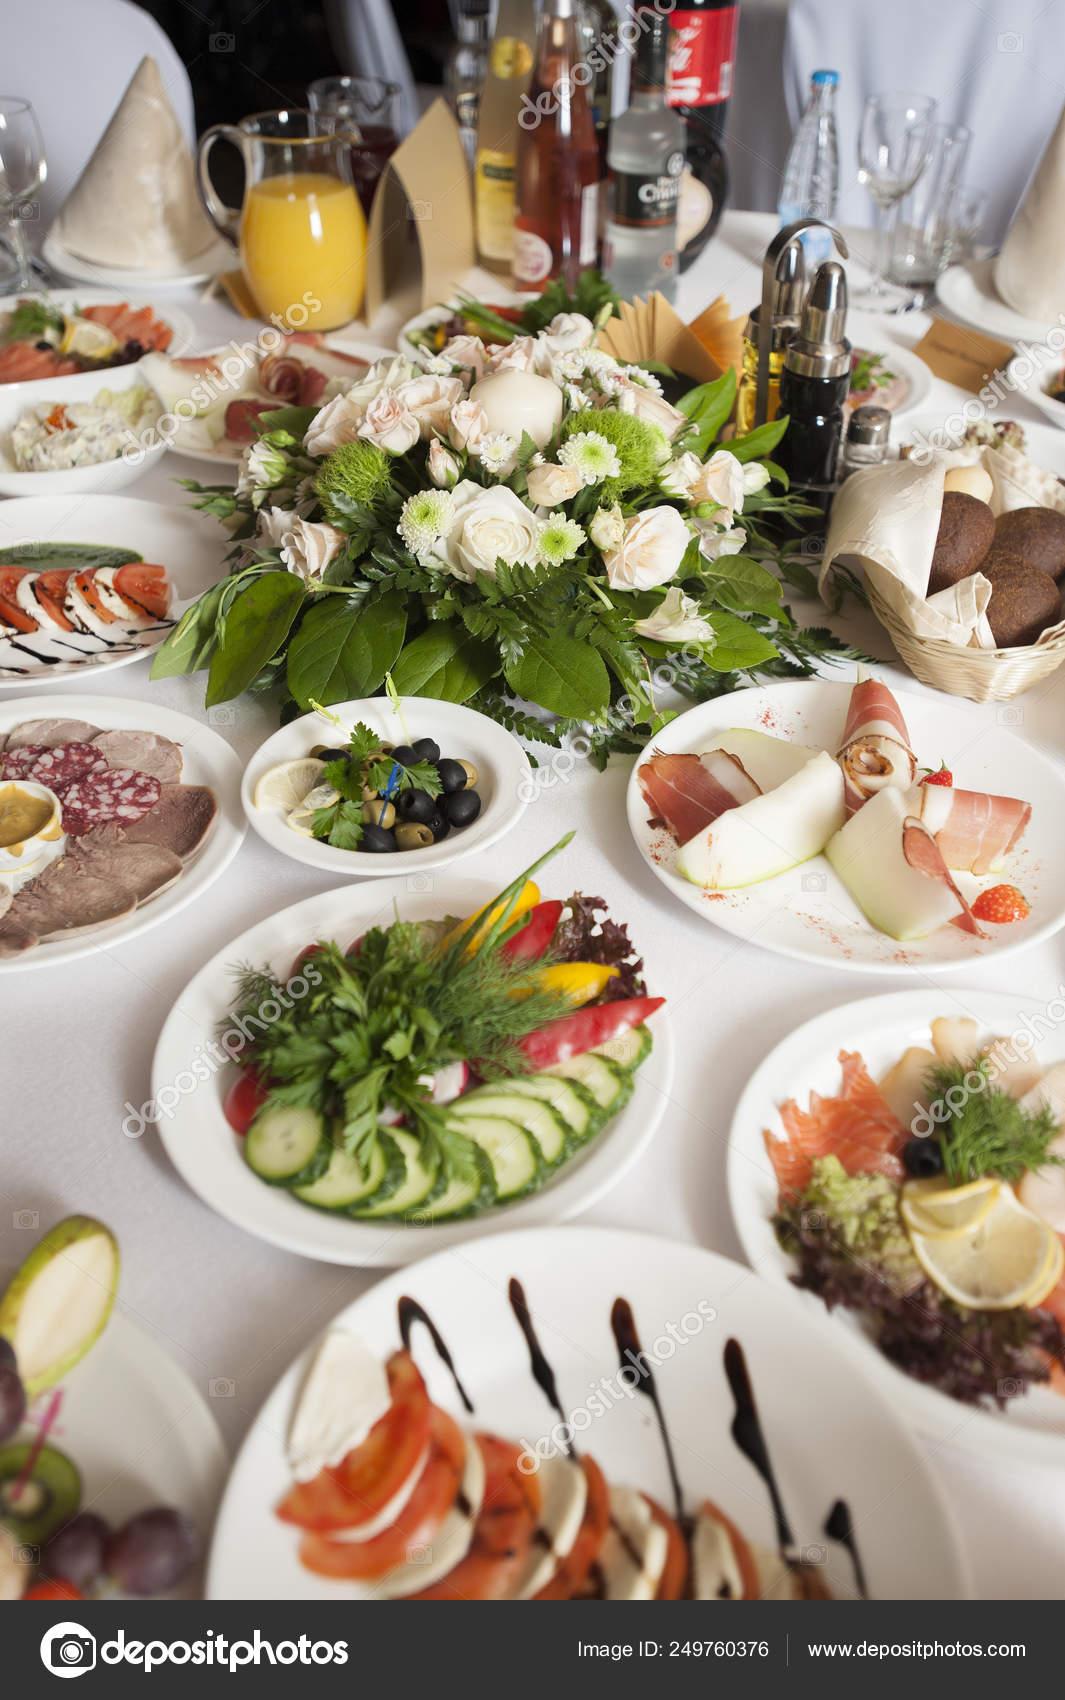 Banquet Table Restaurant Food Drinks Flowers Decoration Stock Photo C Mariyal 249760376